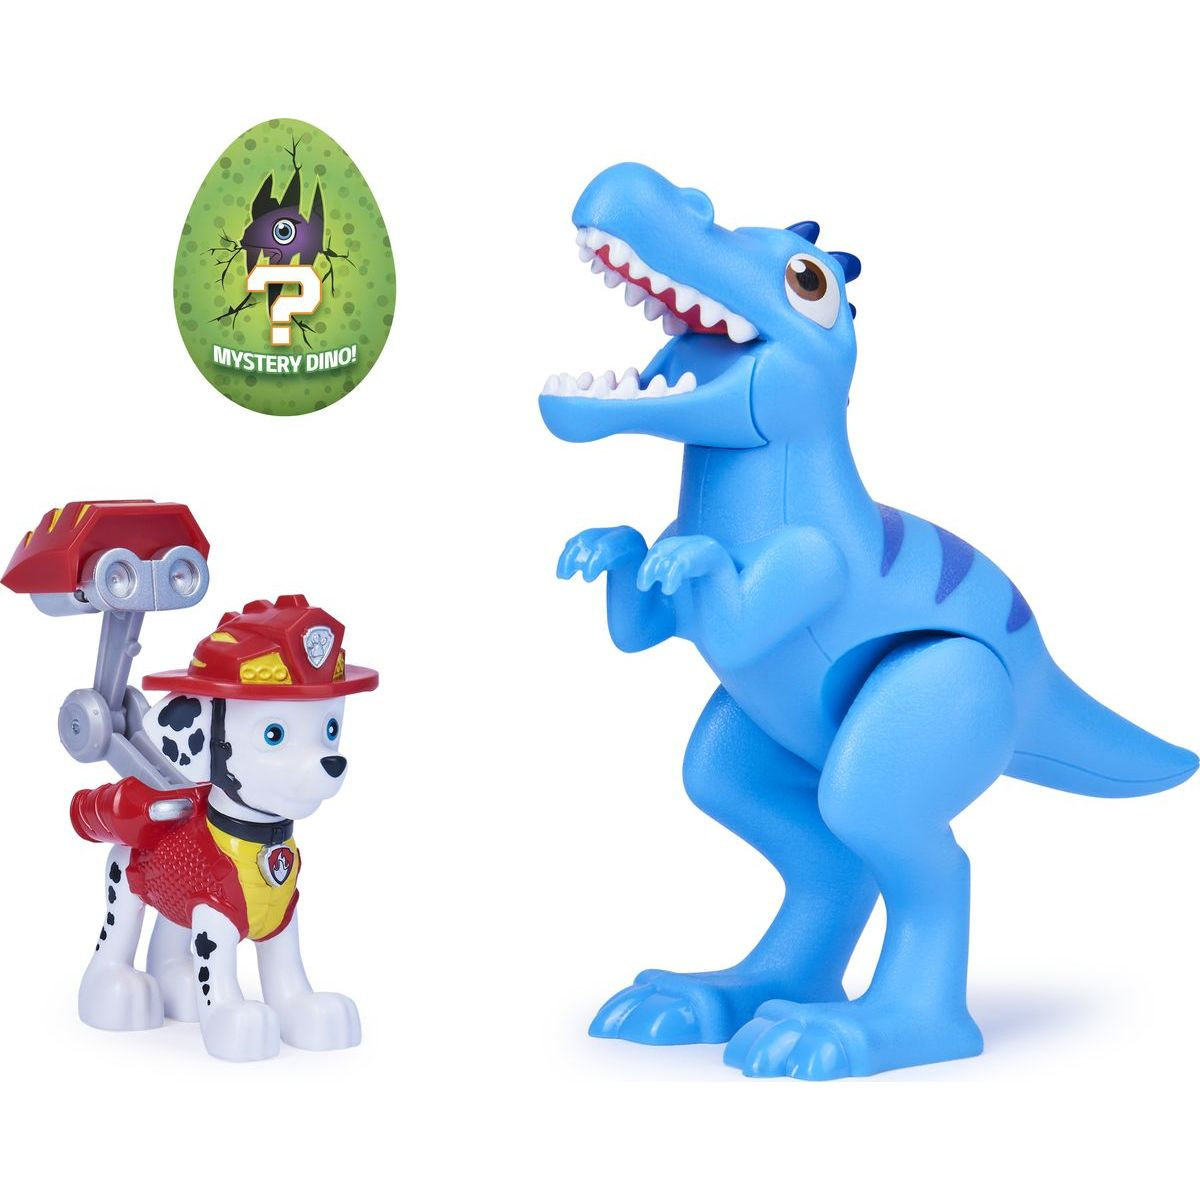 Spin Master Paw Patrol figurka s Dinem a vajíčkem Marshall